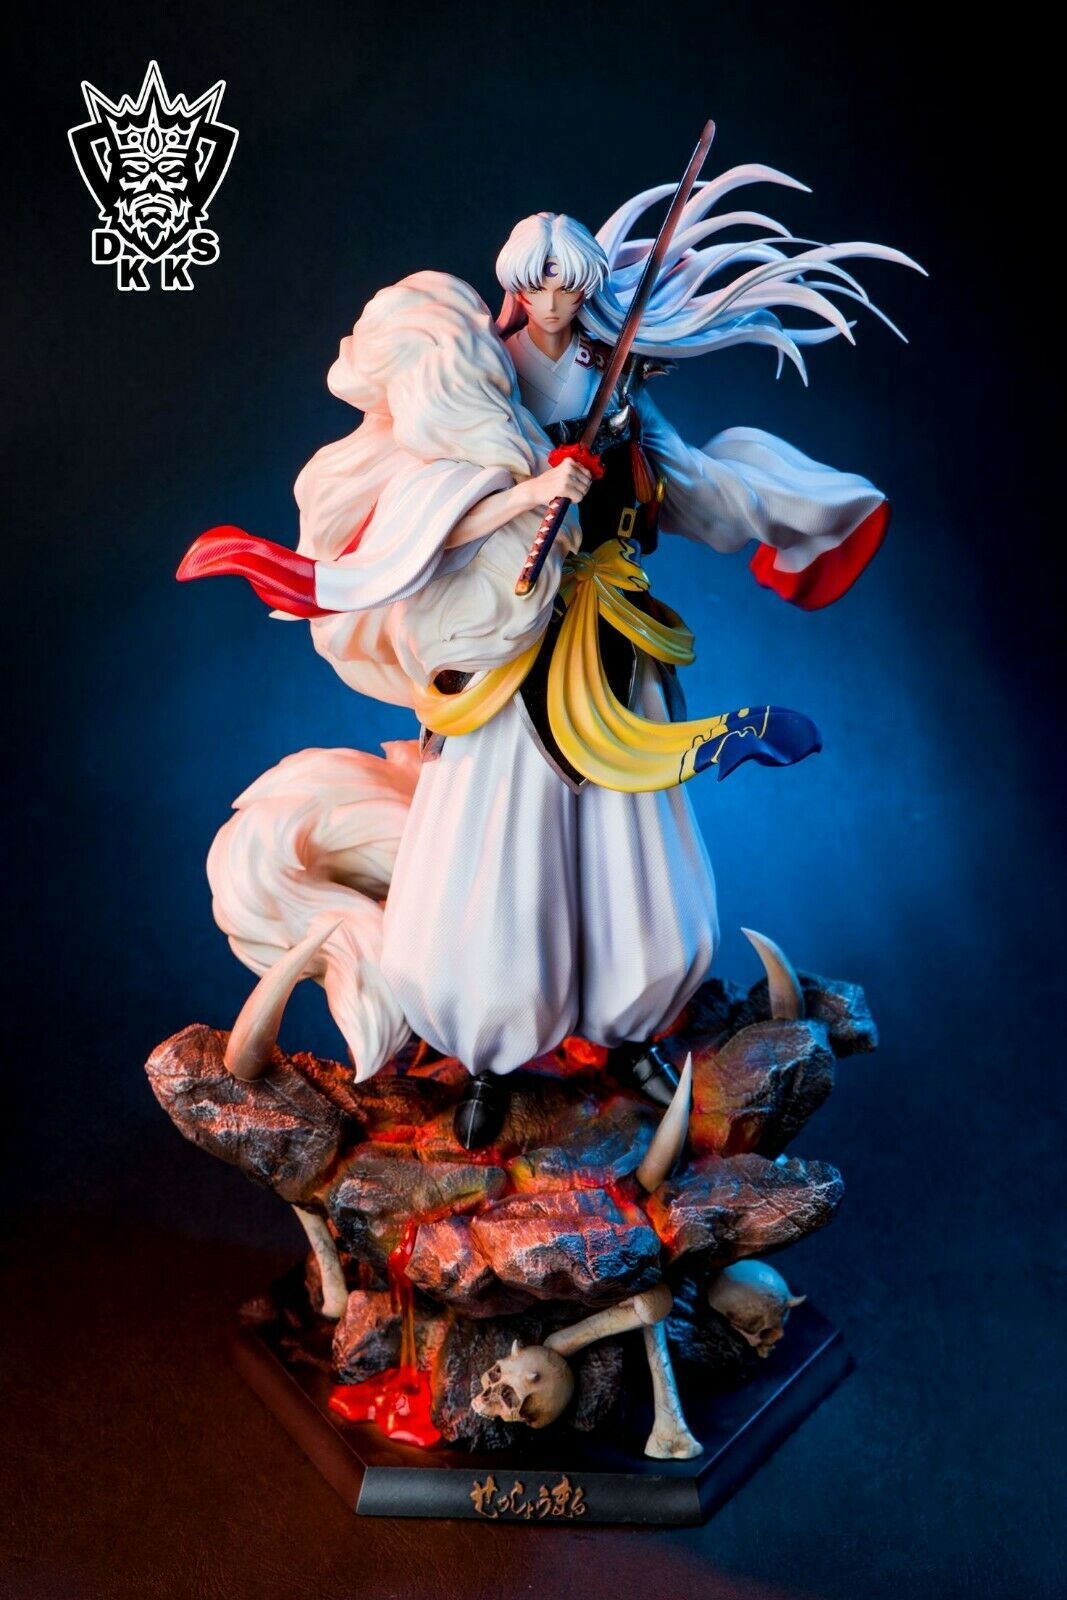 Dark King Studio Sesshoumaru Resin 1/6 Scale Patined Figure GK Collection N